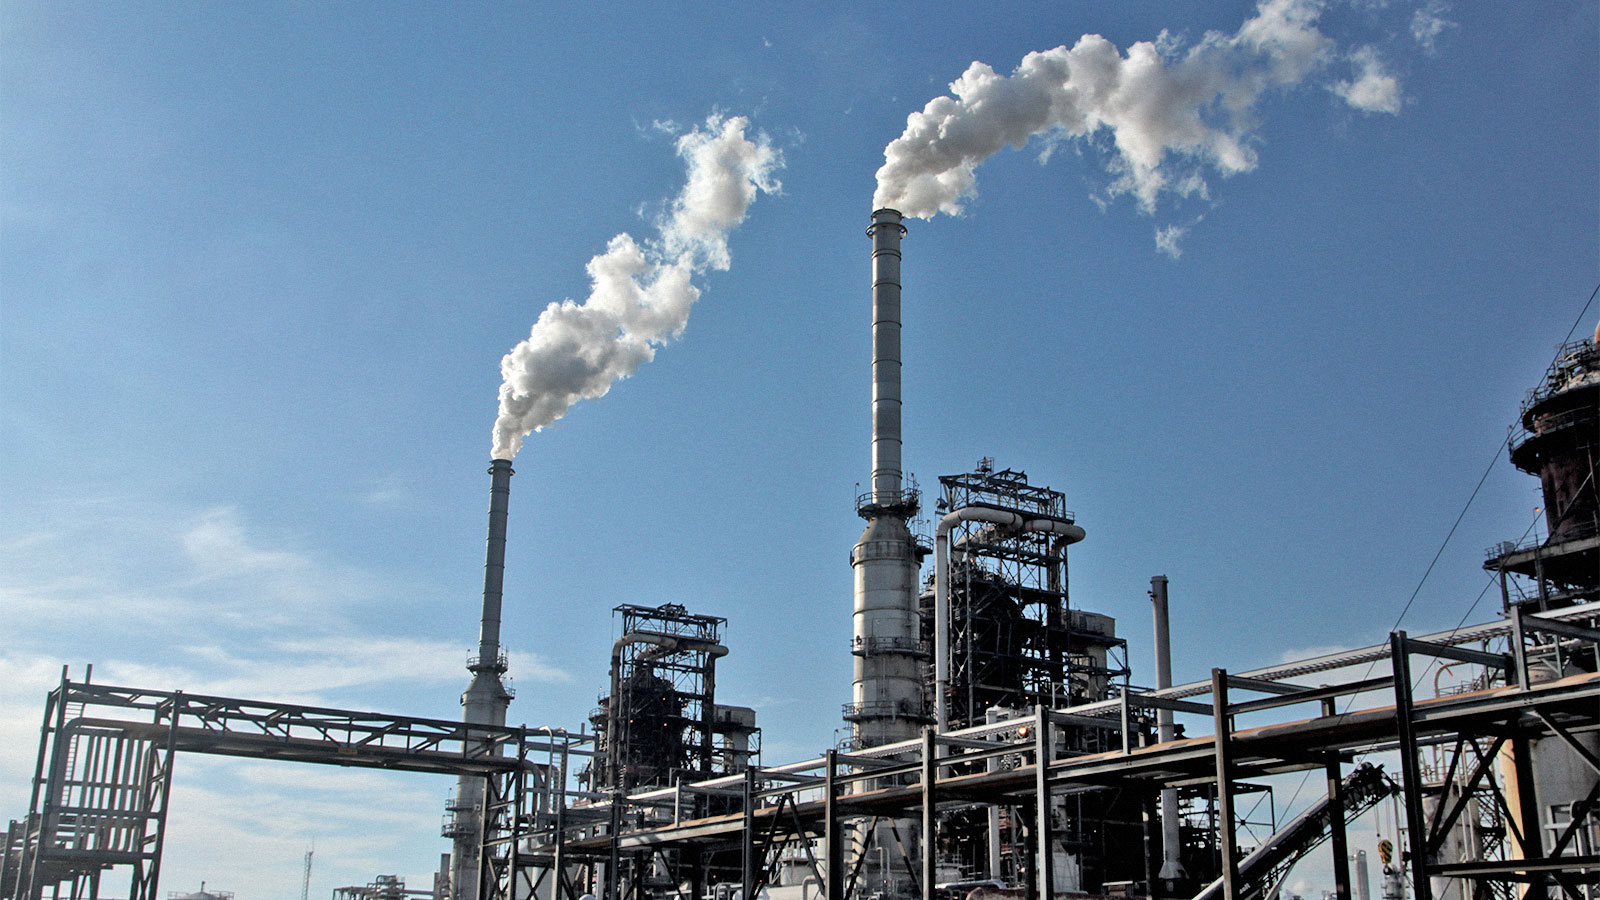 A refinery in Lake Charles, Louisiana